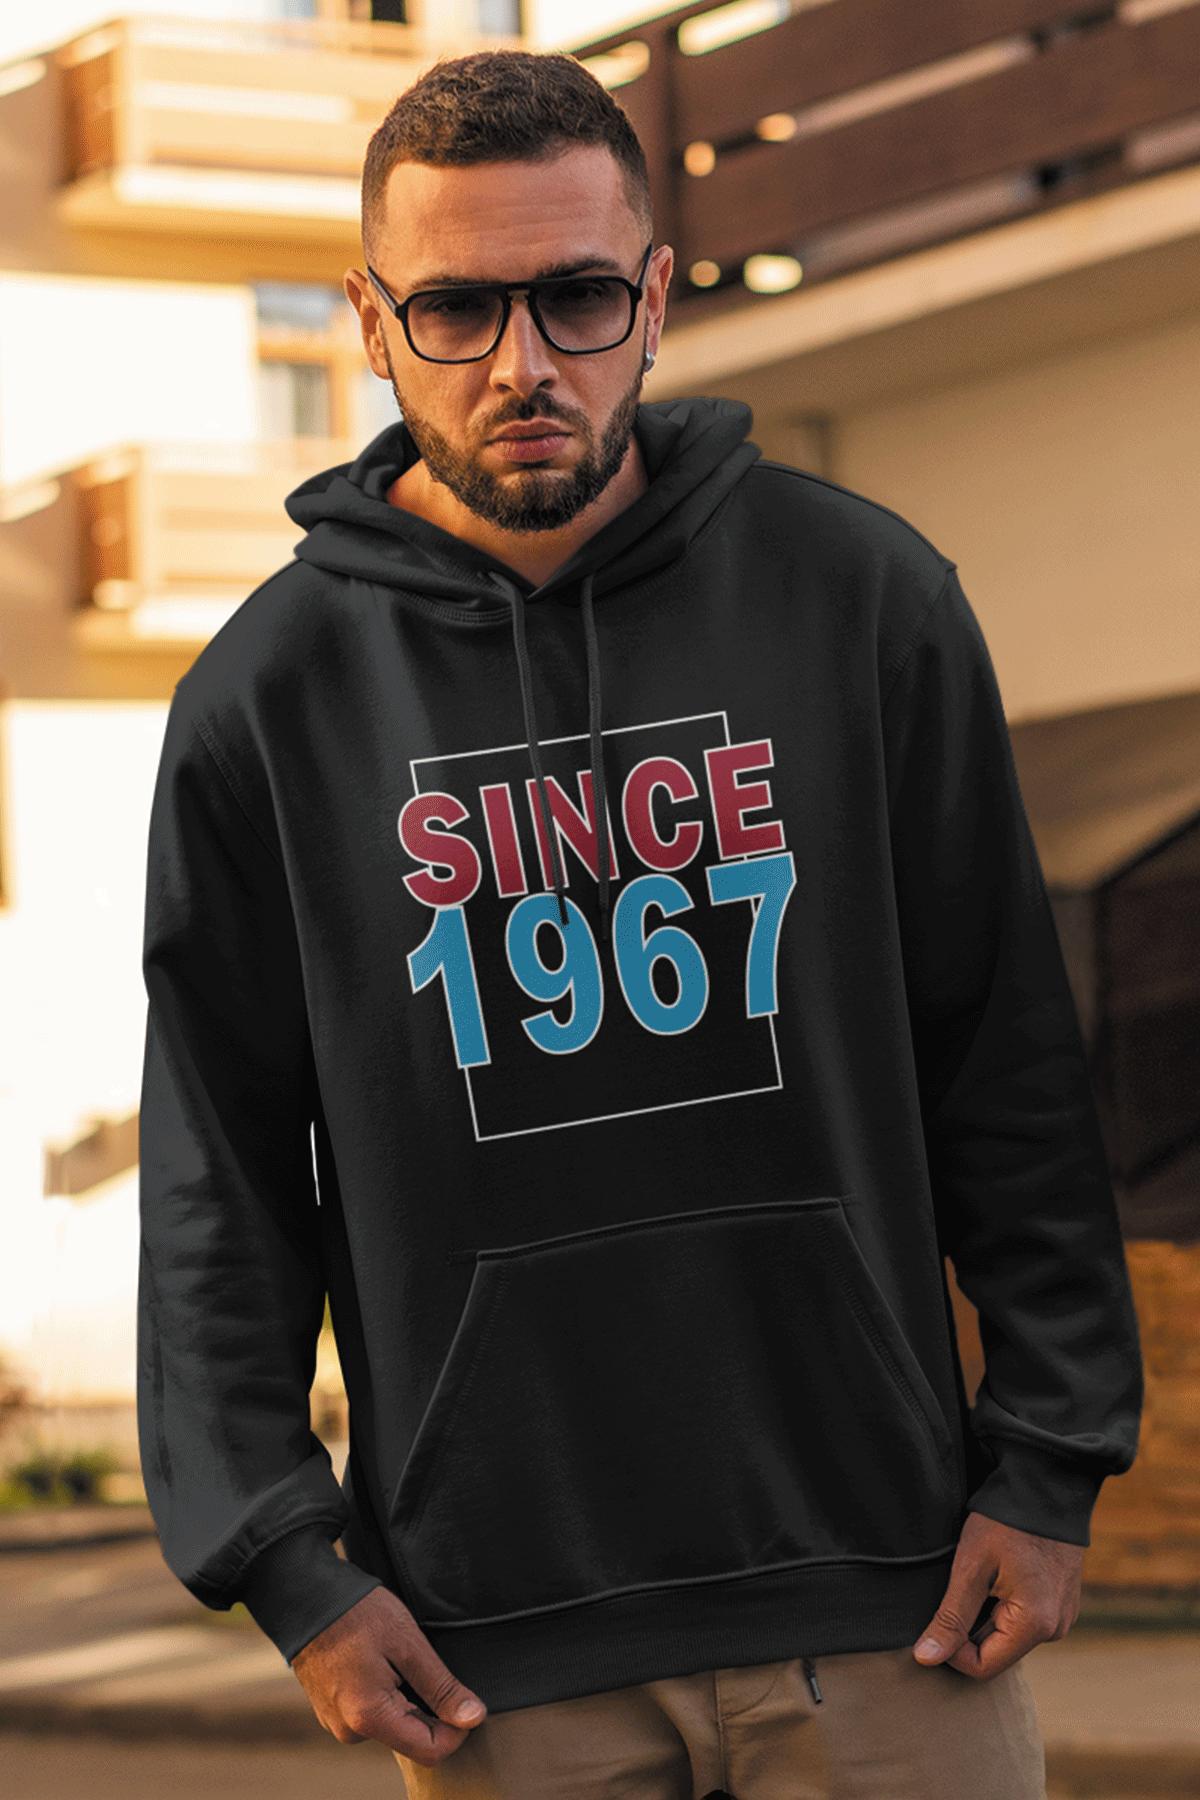 Since 1967 Siyah Erkek Kapşonlu Sweatshirt - Hoodie